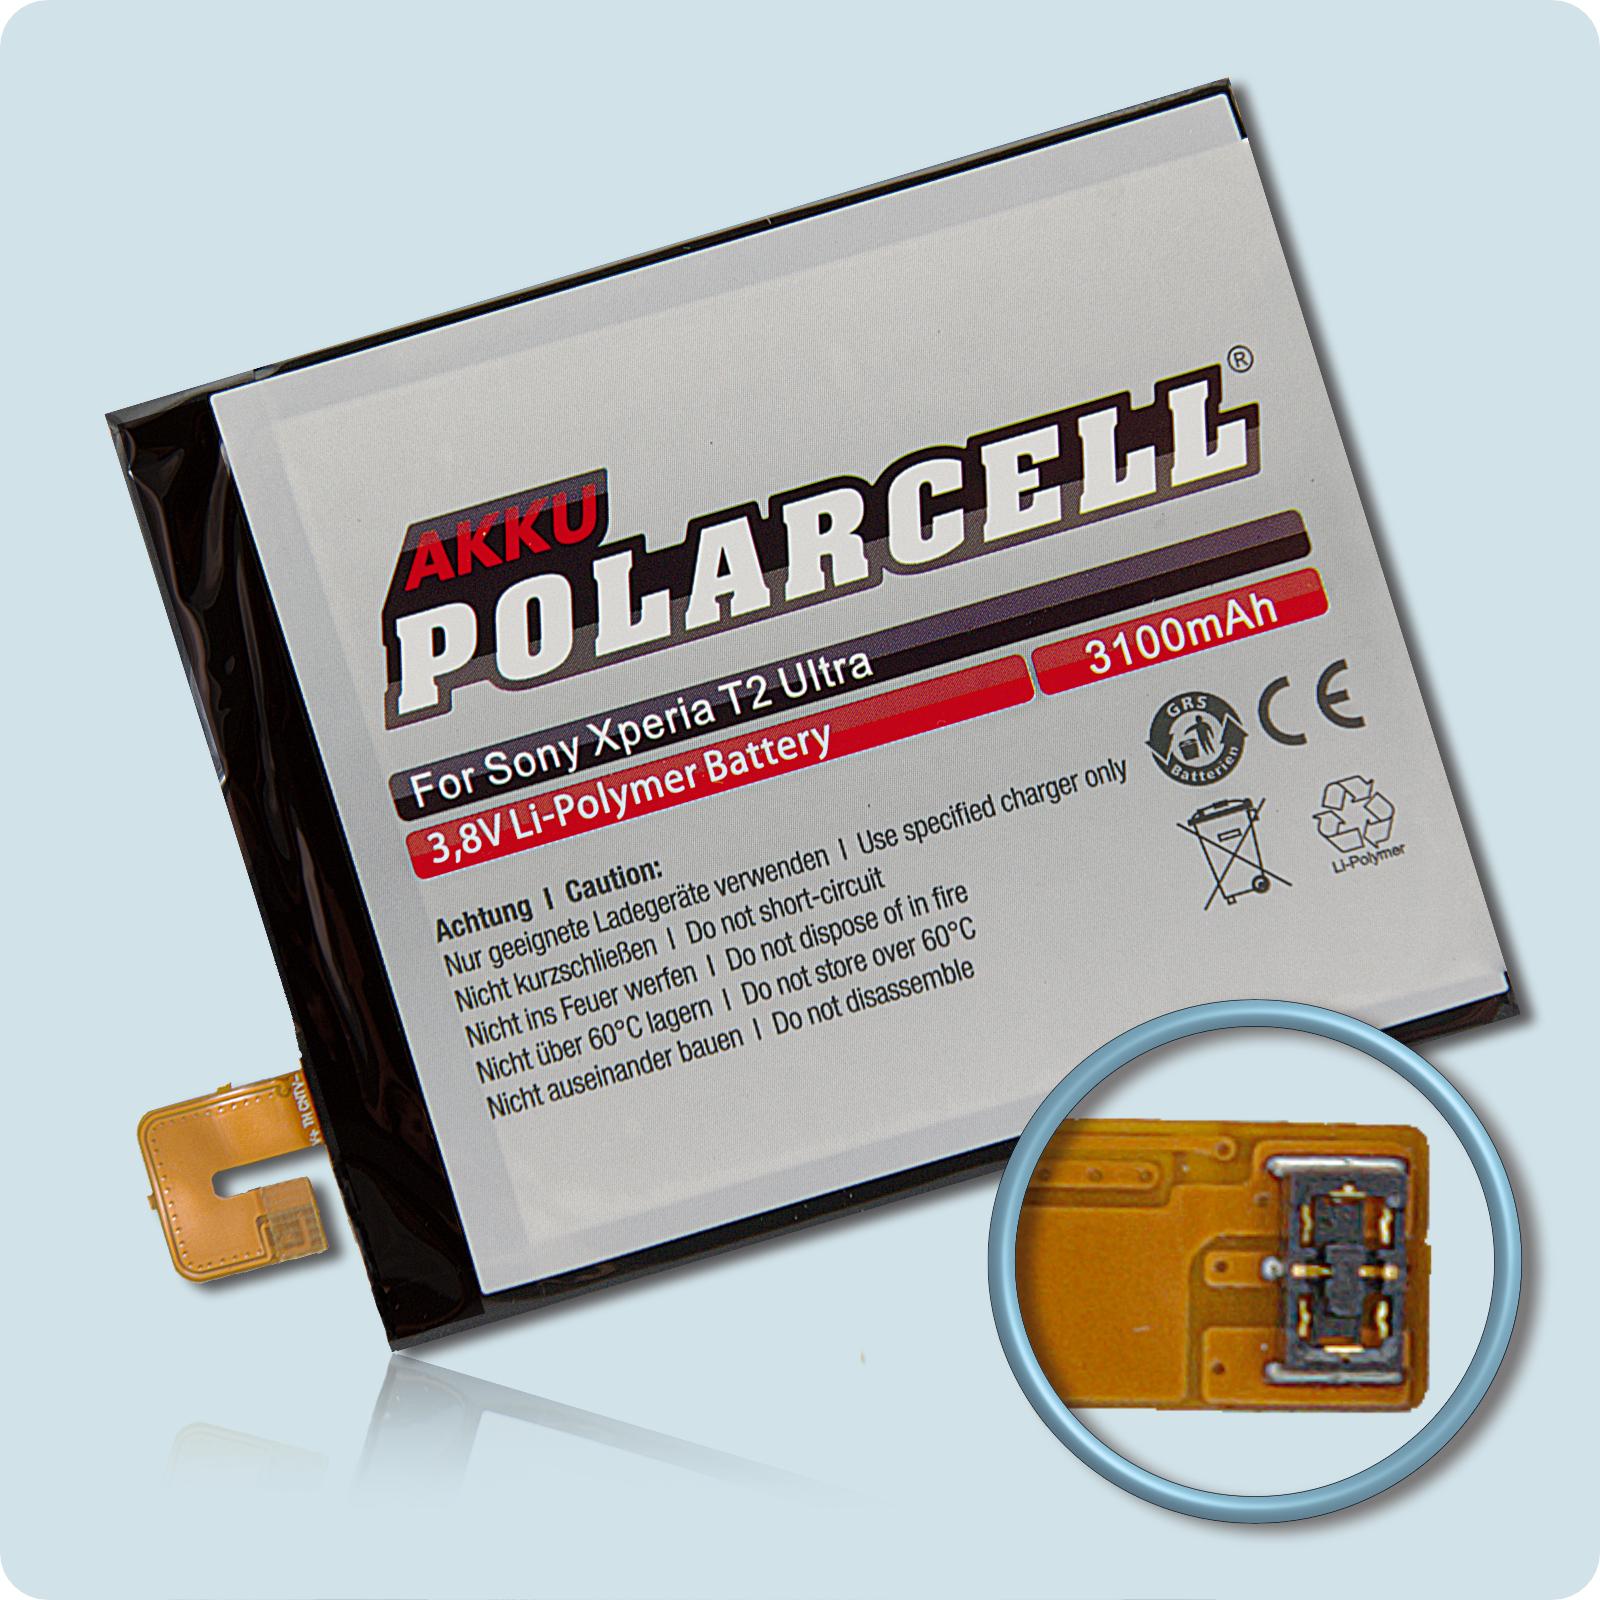 PolarCell Hochleistungs-Akku ersetzt Originalakku Sony AGPB012-A001